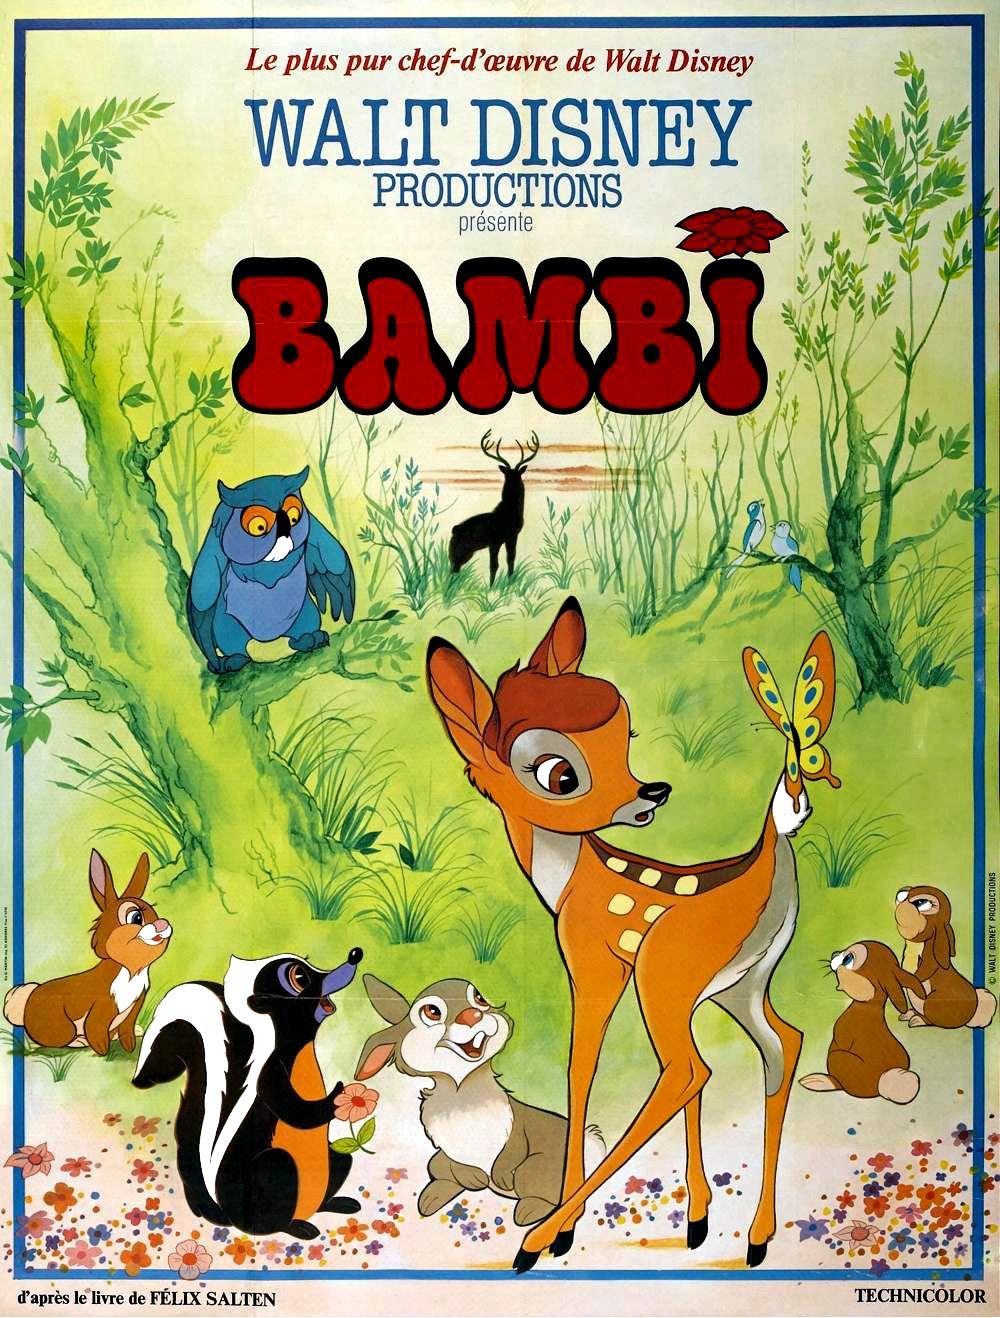 Bambi (film, 1942)